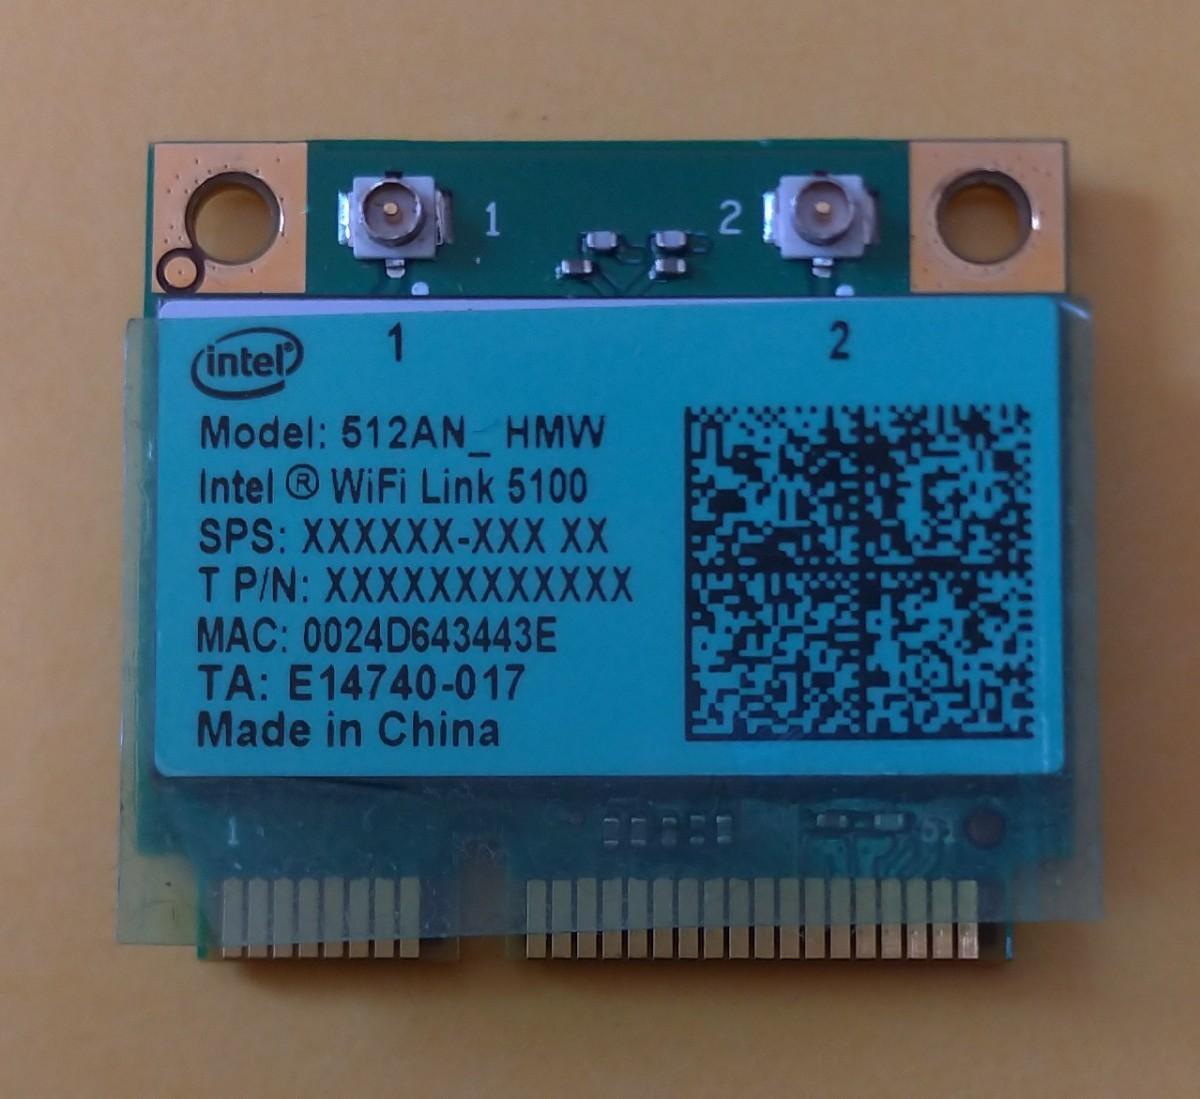 無線LAN WIFIカード Intel 512AN_HMW